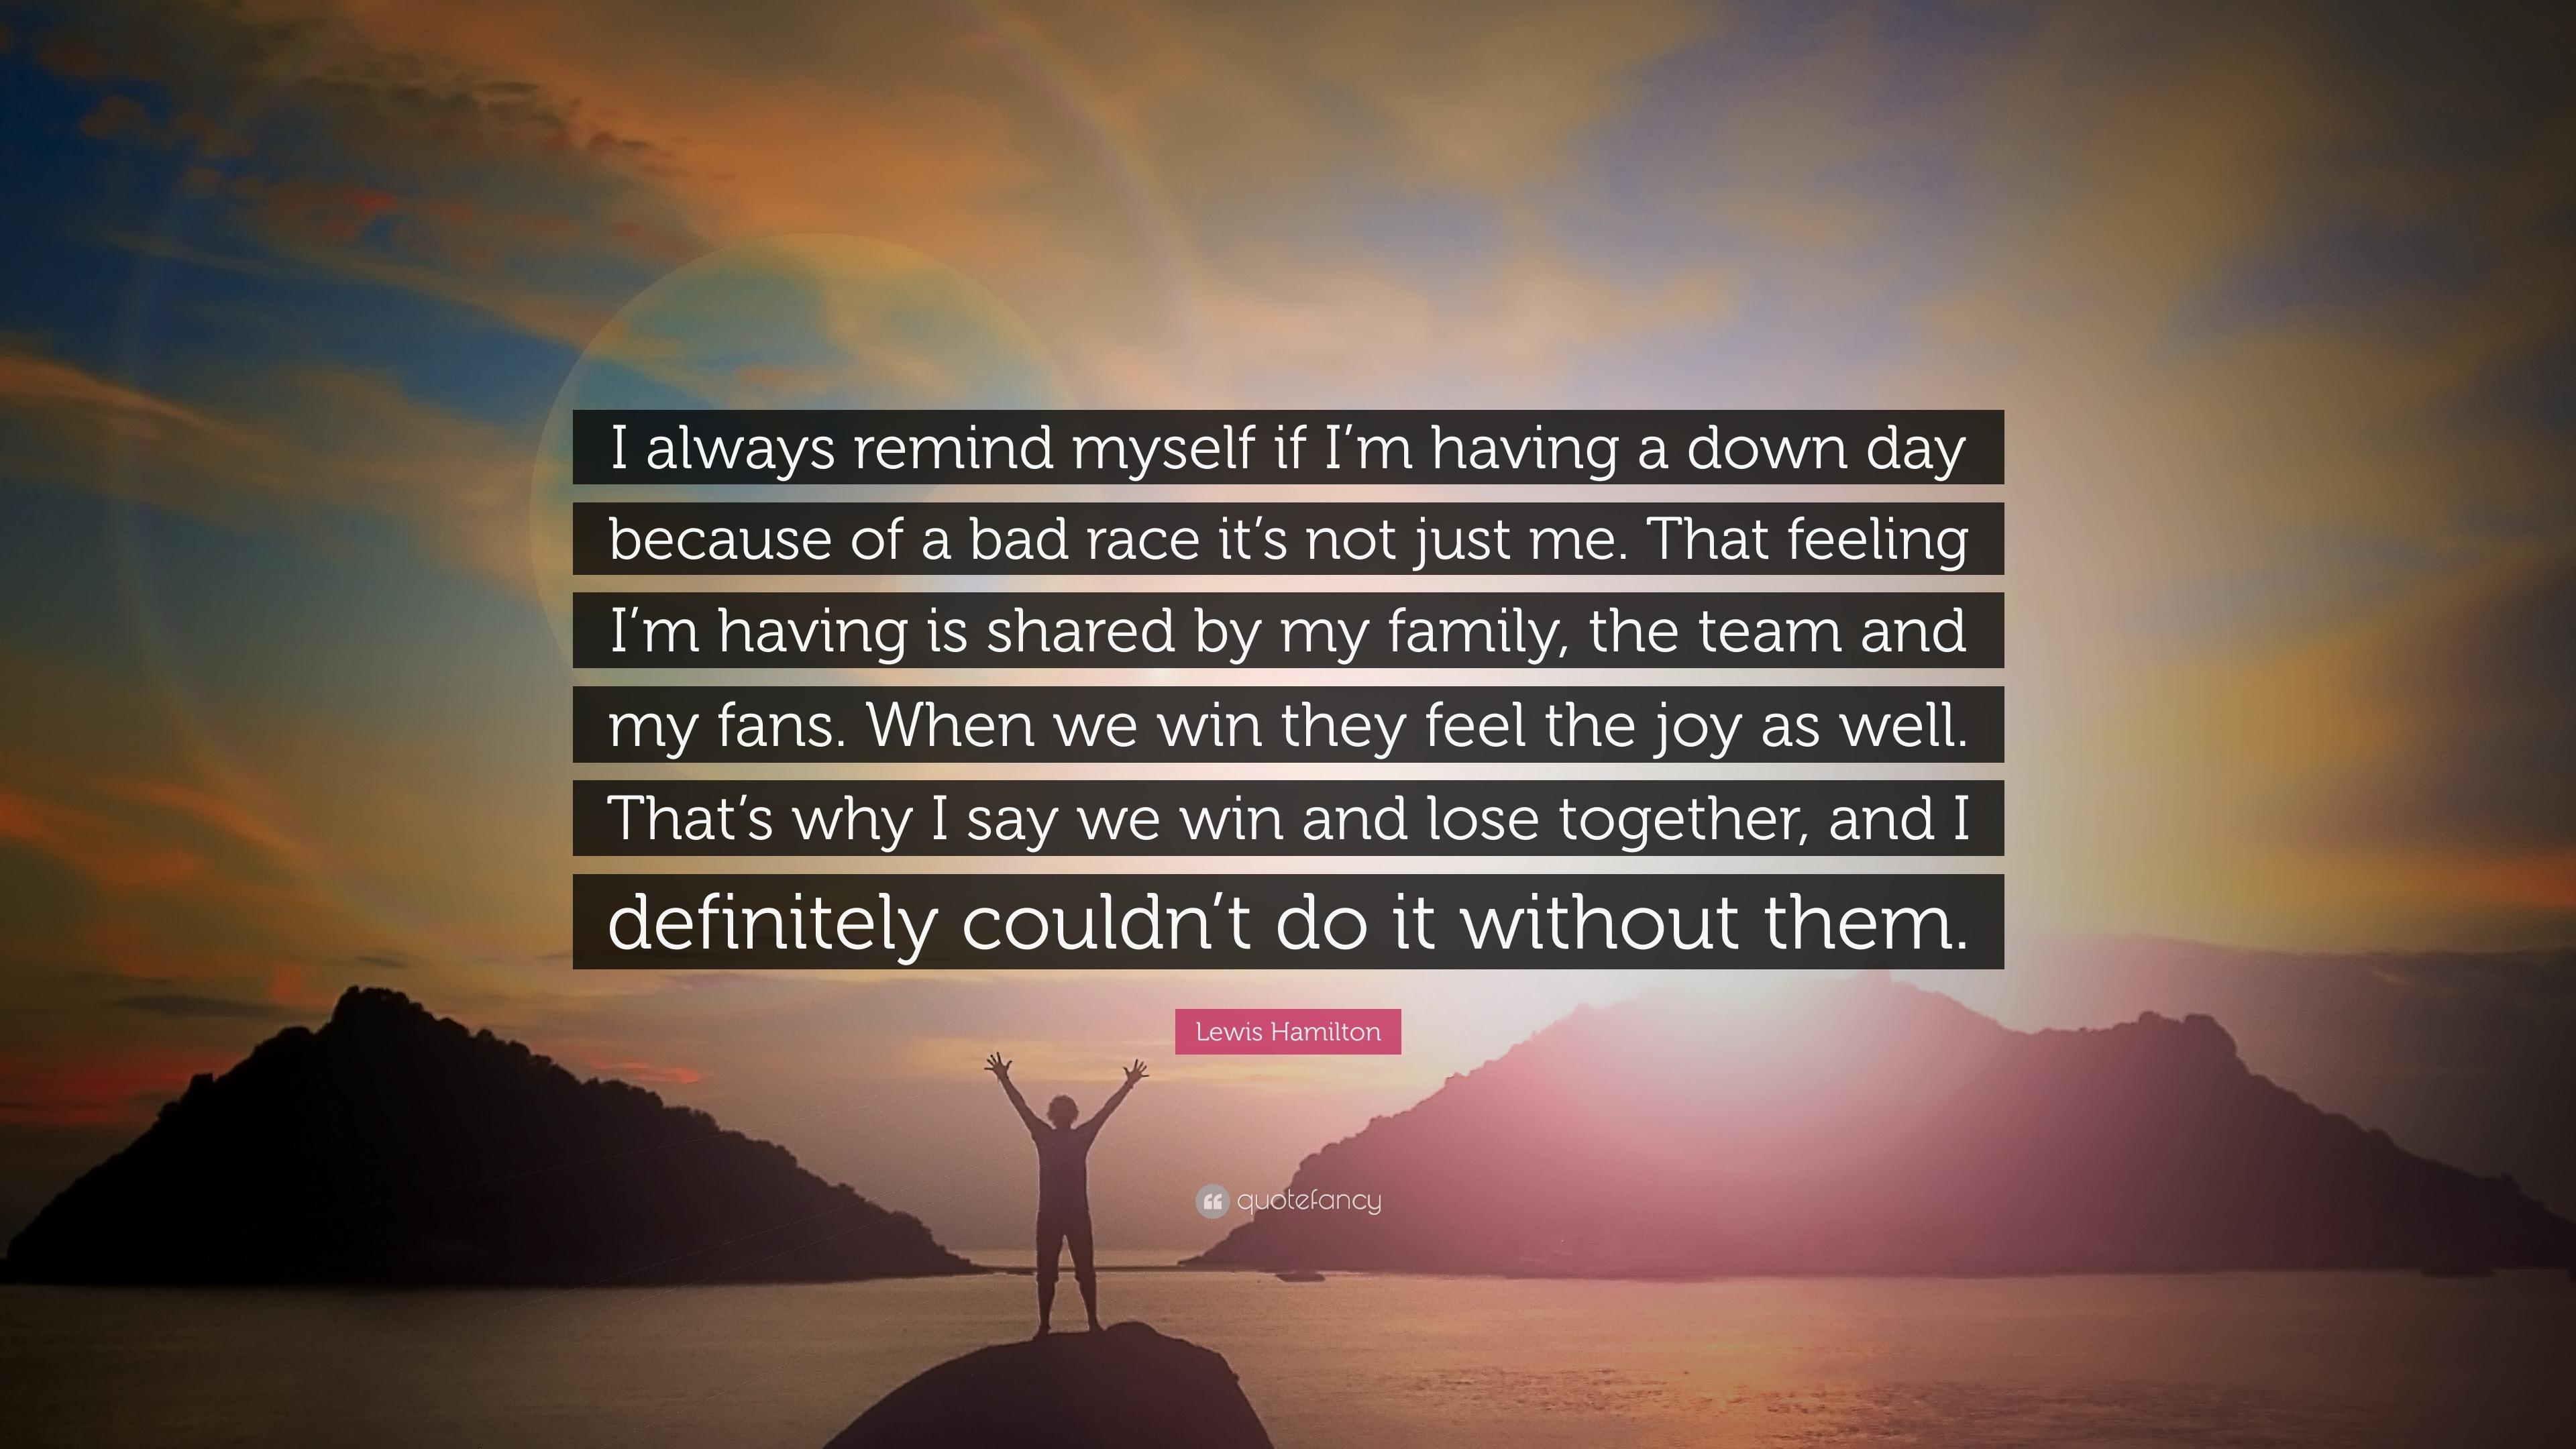 Lewis Hamilton Quote I Always Remind Myself If Im Having A Down